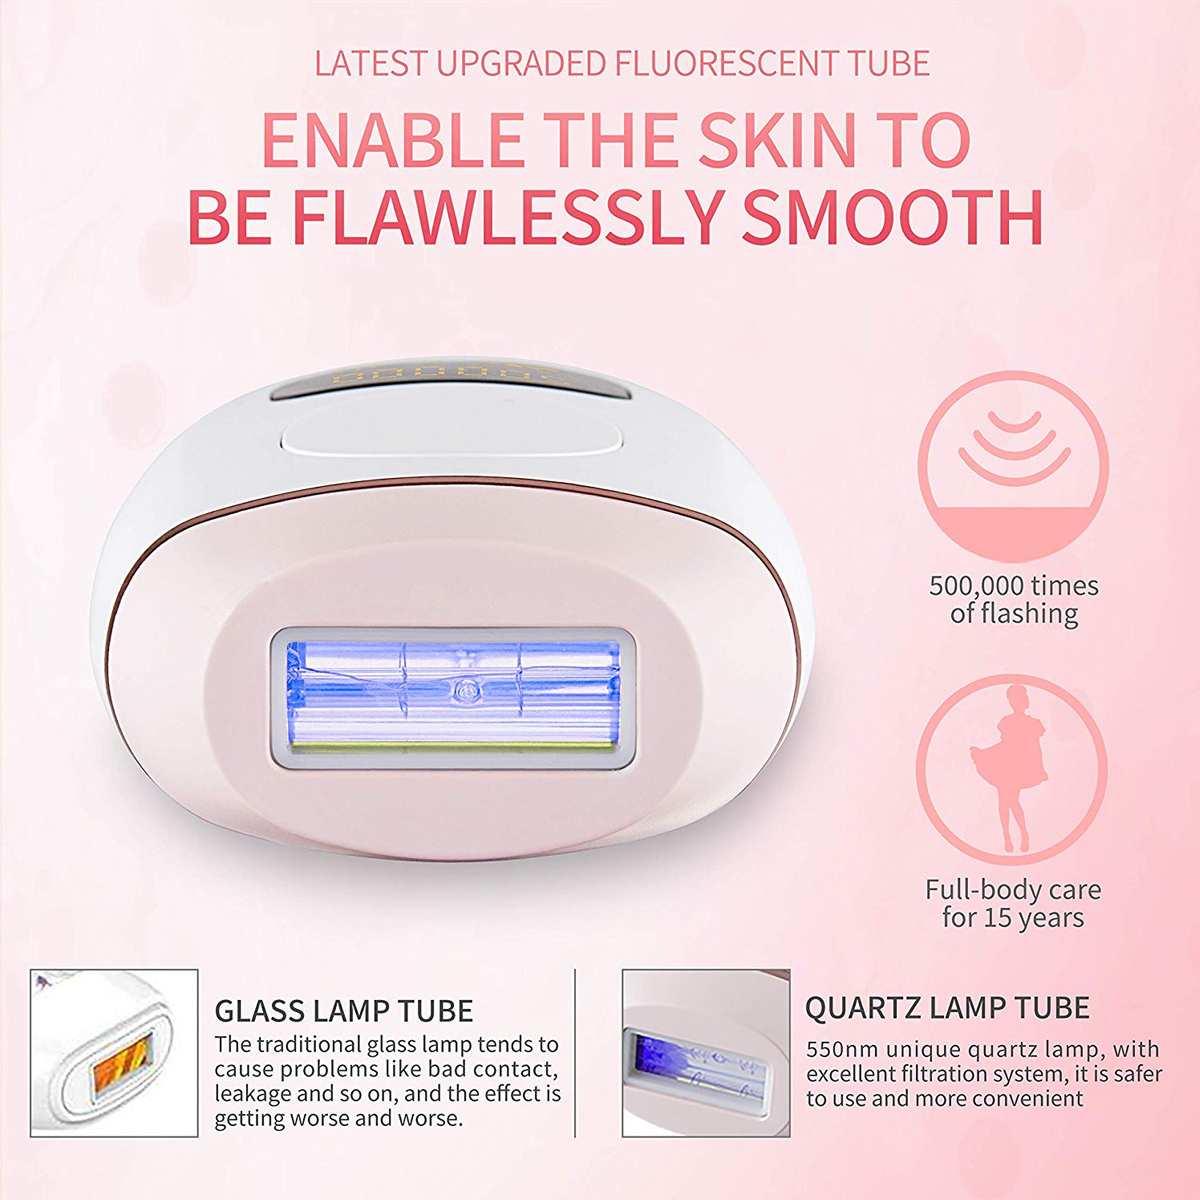 Upgrade 500000 Flash Professional Permanent IPL Epilator Laser Hair Removal 5 level LCD Display Bikini Painless Hair Remover enlarge